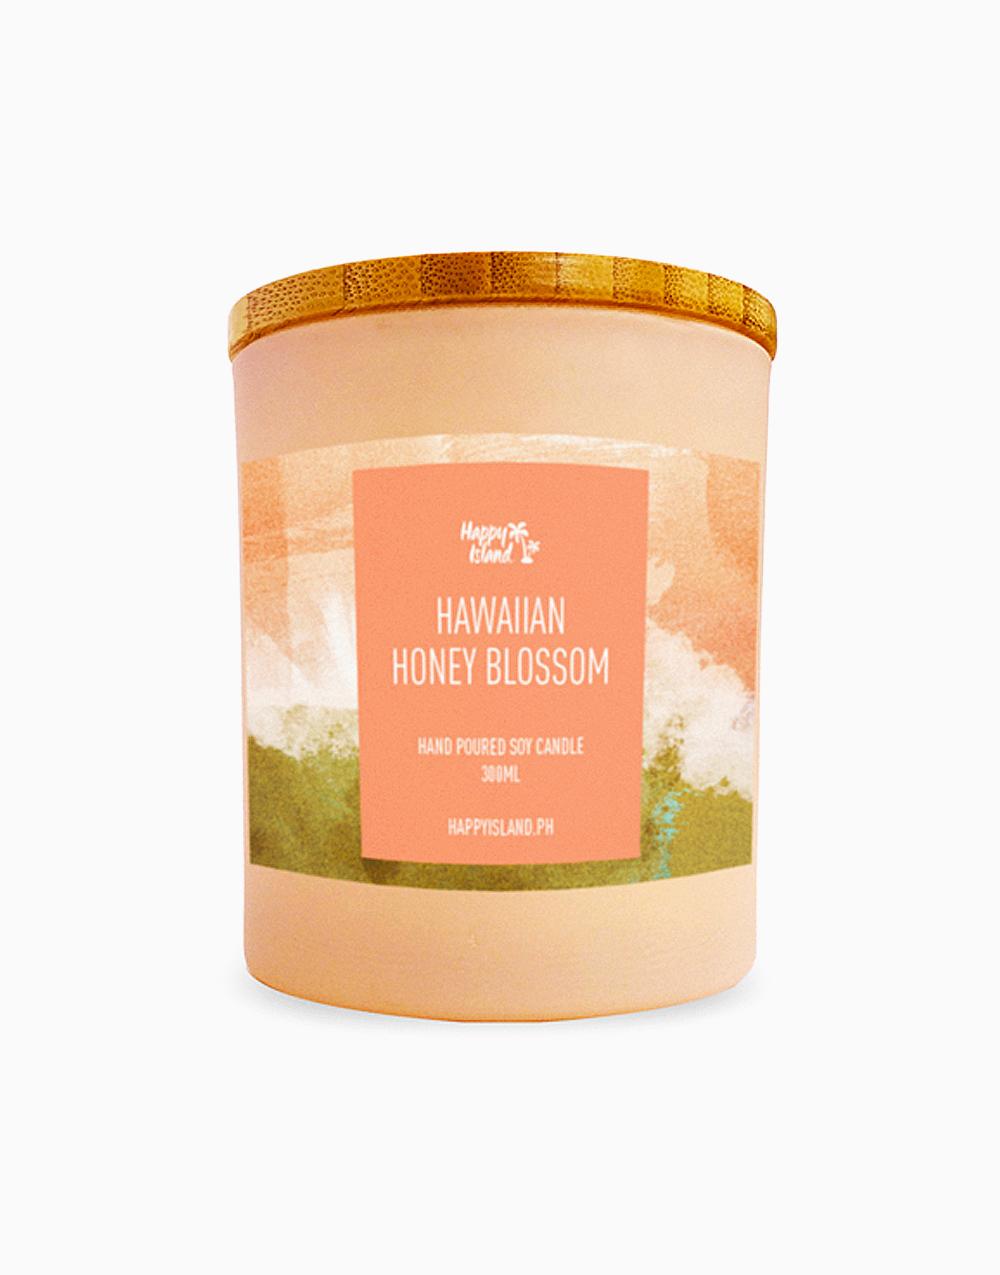 Hawaiian Honey Blossom Soy Candle (10oz/300ml) by Happy Island